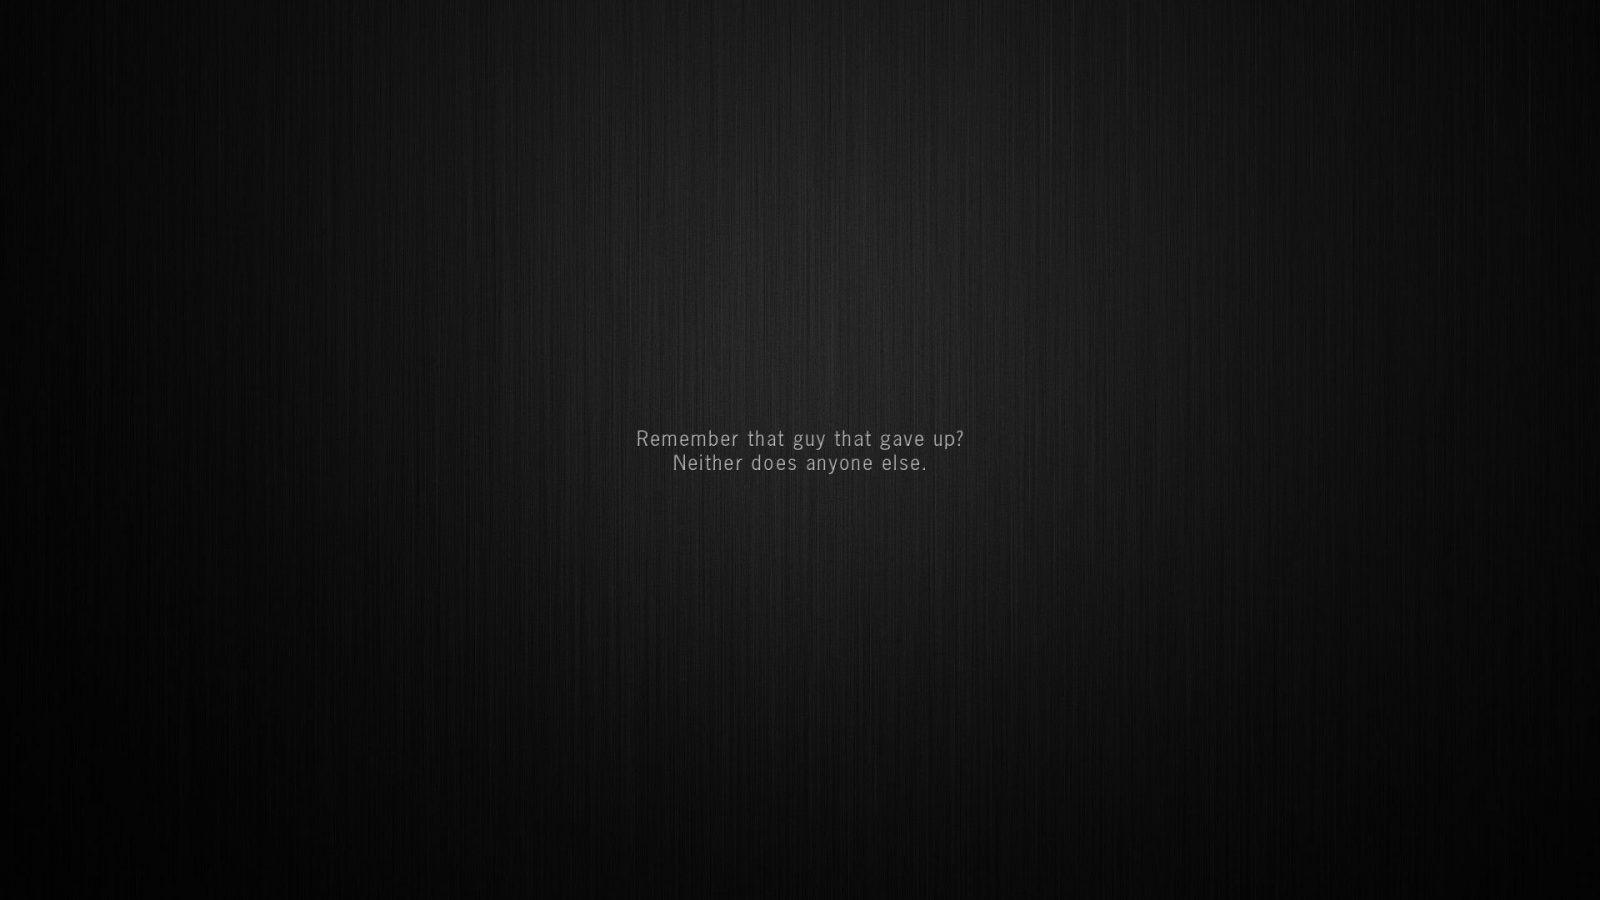 Bts Lyrics Laptop Wallpapers Top Free Bts Lyrics Laptop Backgrounds Wallpaperaccess